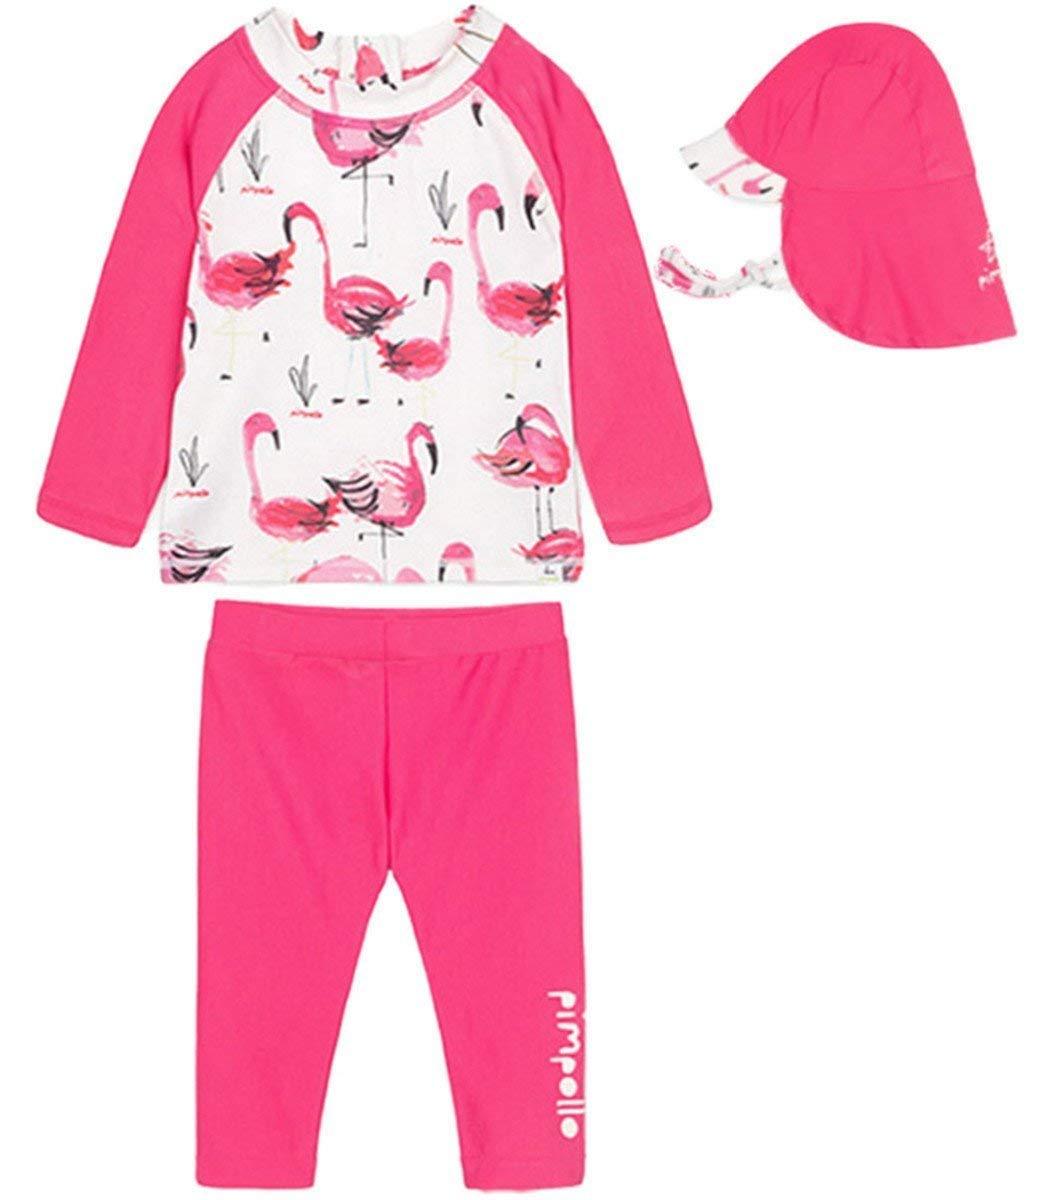 c71c249b88 Baby Kids Little Girls Two Pieces Flamingo Long Sleeve Full Body Rash Guard  UPF 50+